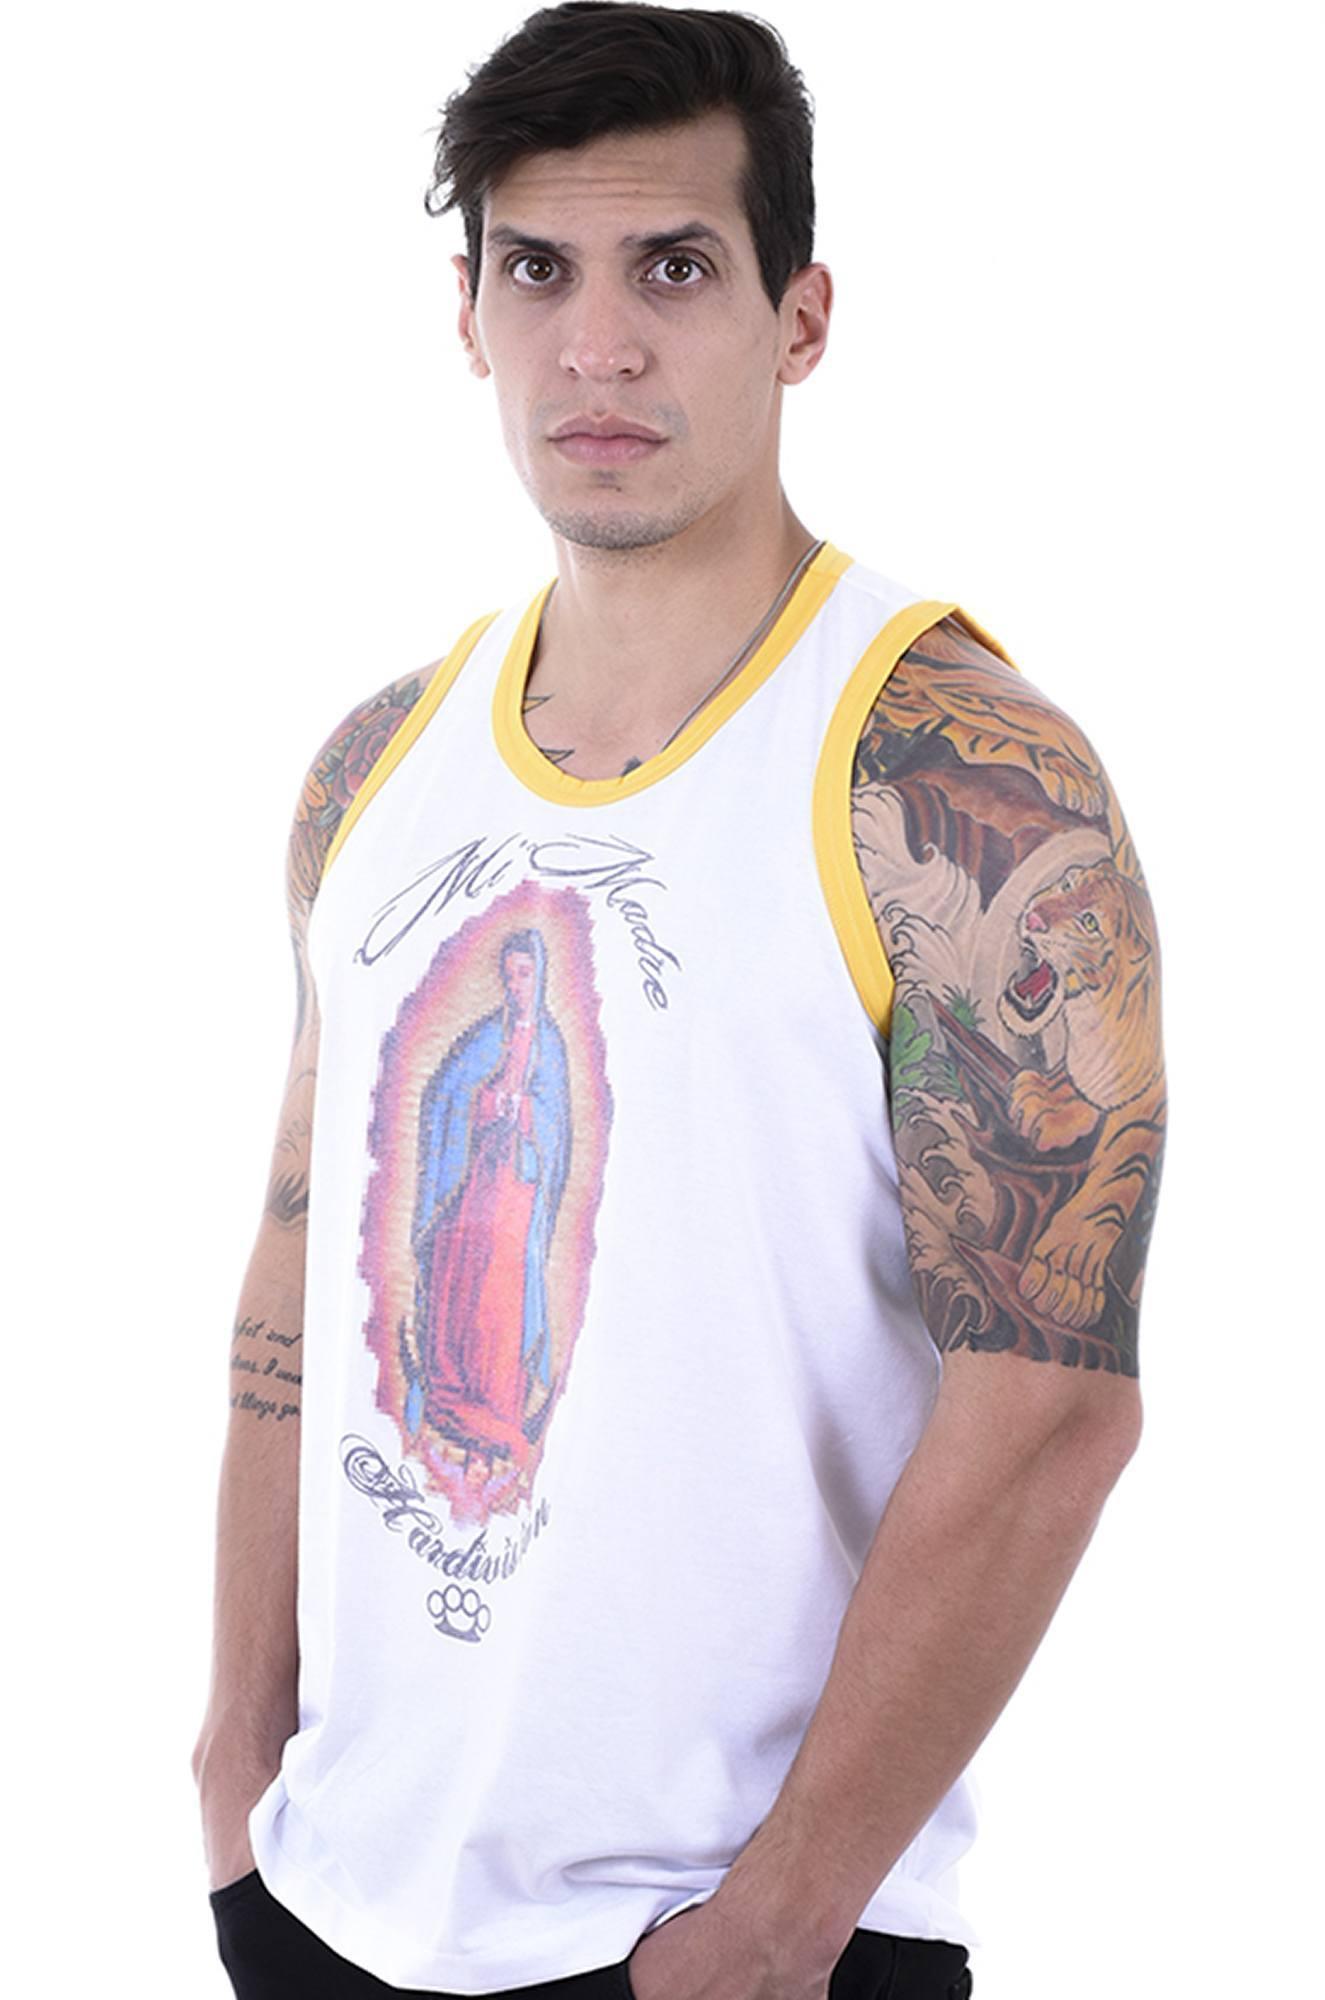 4e17fef3e0 Camiseta Regata Masculina Hardivision Mi Madre Branco